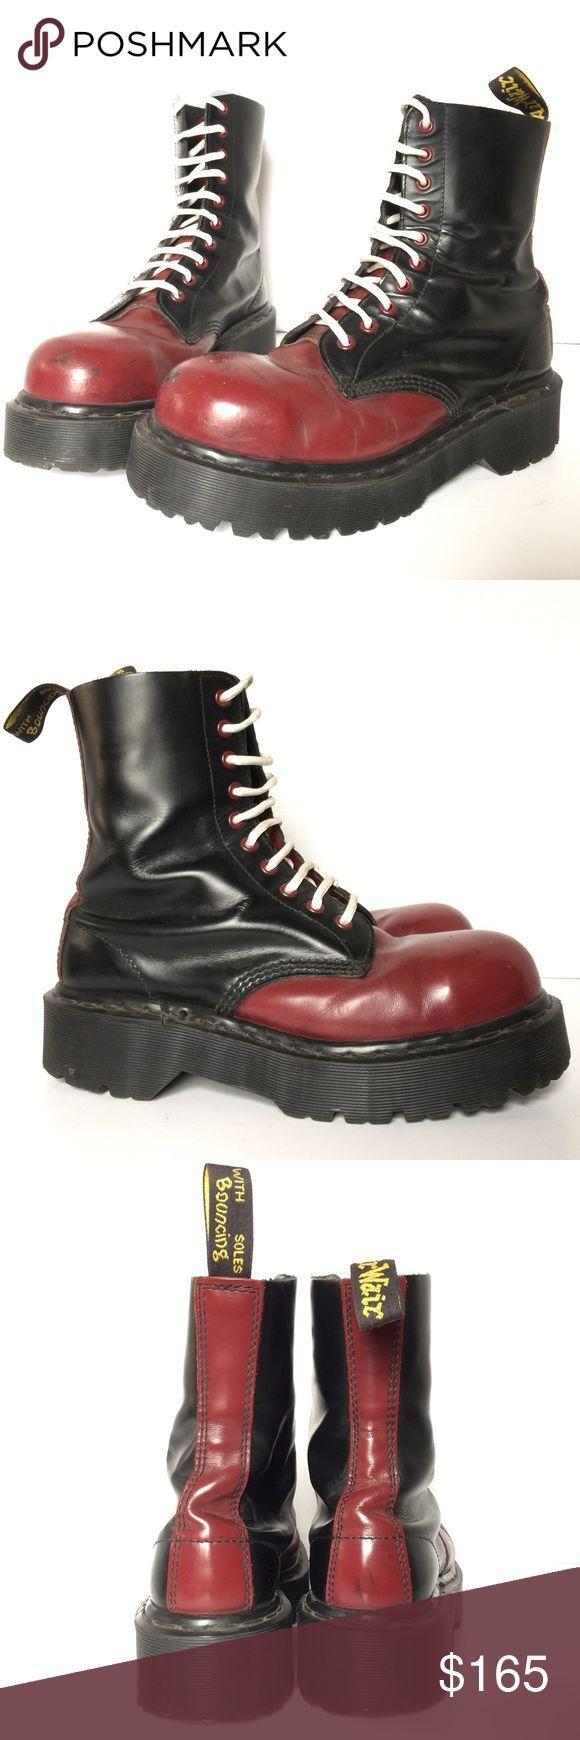 Dr. Martens Red/Black Steel Toe boot M 9/W 10 UK8 Two tone oxblood & black Docs. Steel toe. 10 eyelet. MADE IN ENGLAND. Vintage. UK 8. Men's US 9. Women's US 10 Dr. Martens Shoes Lace Up Boots